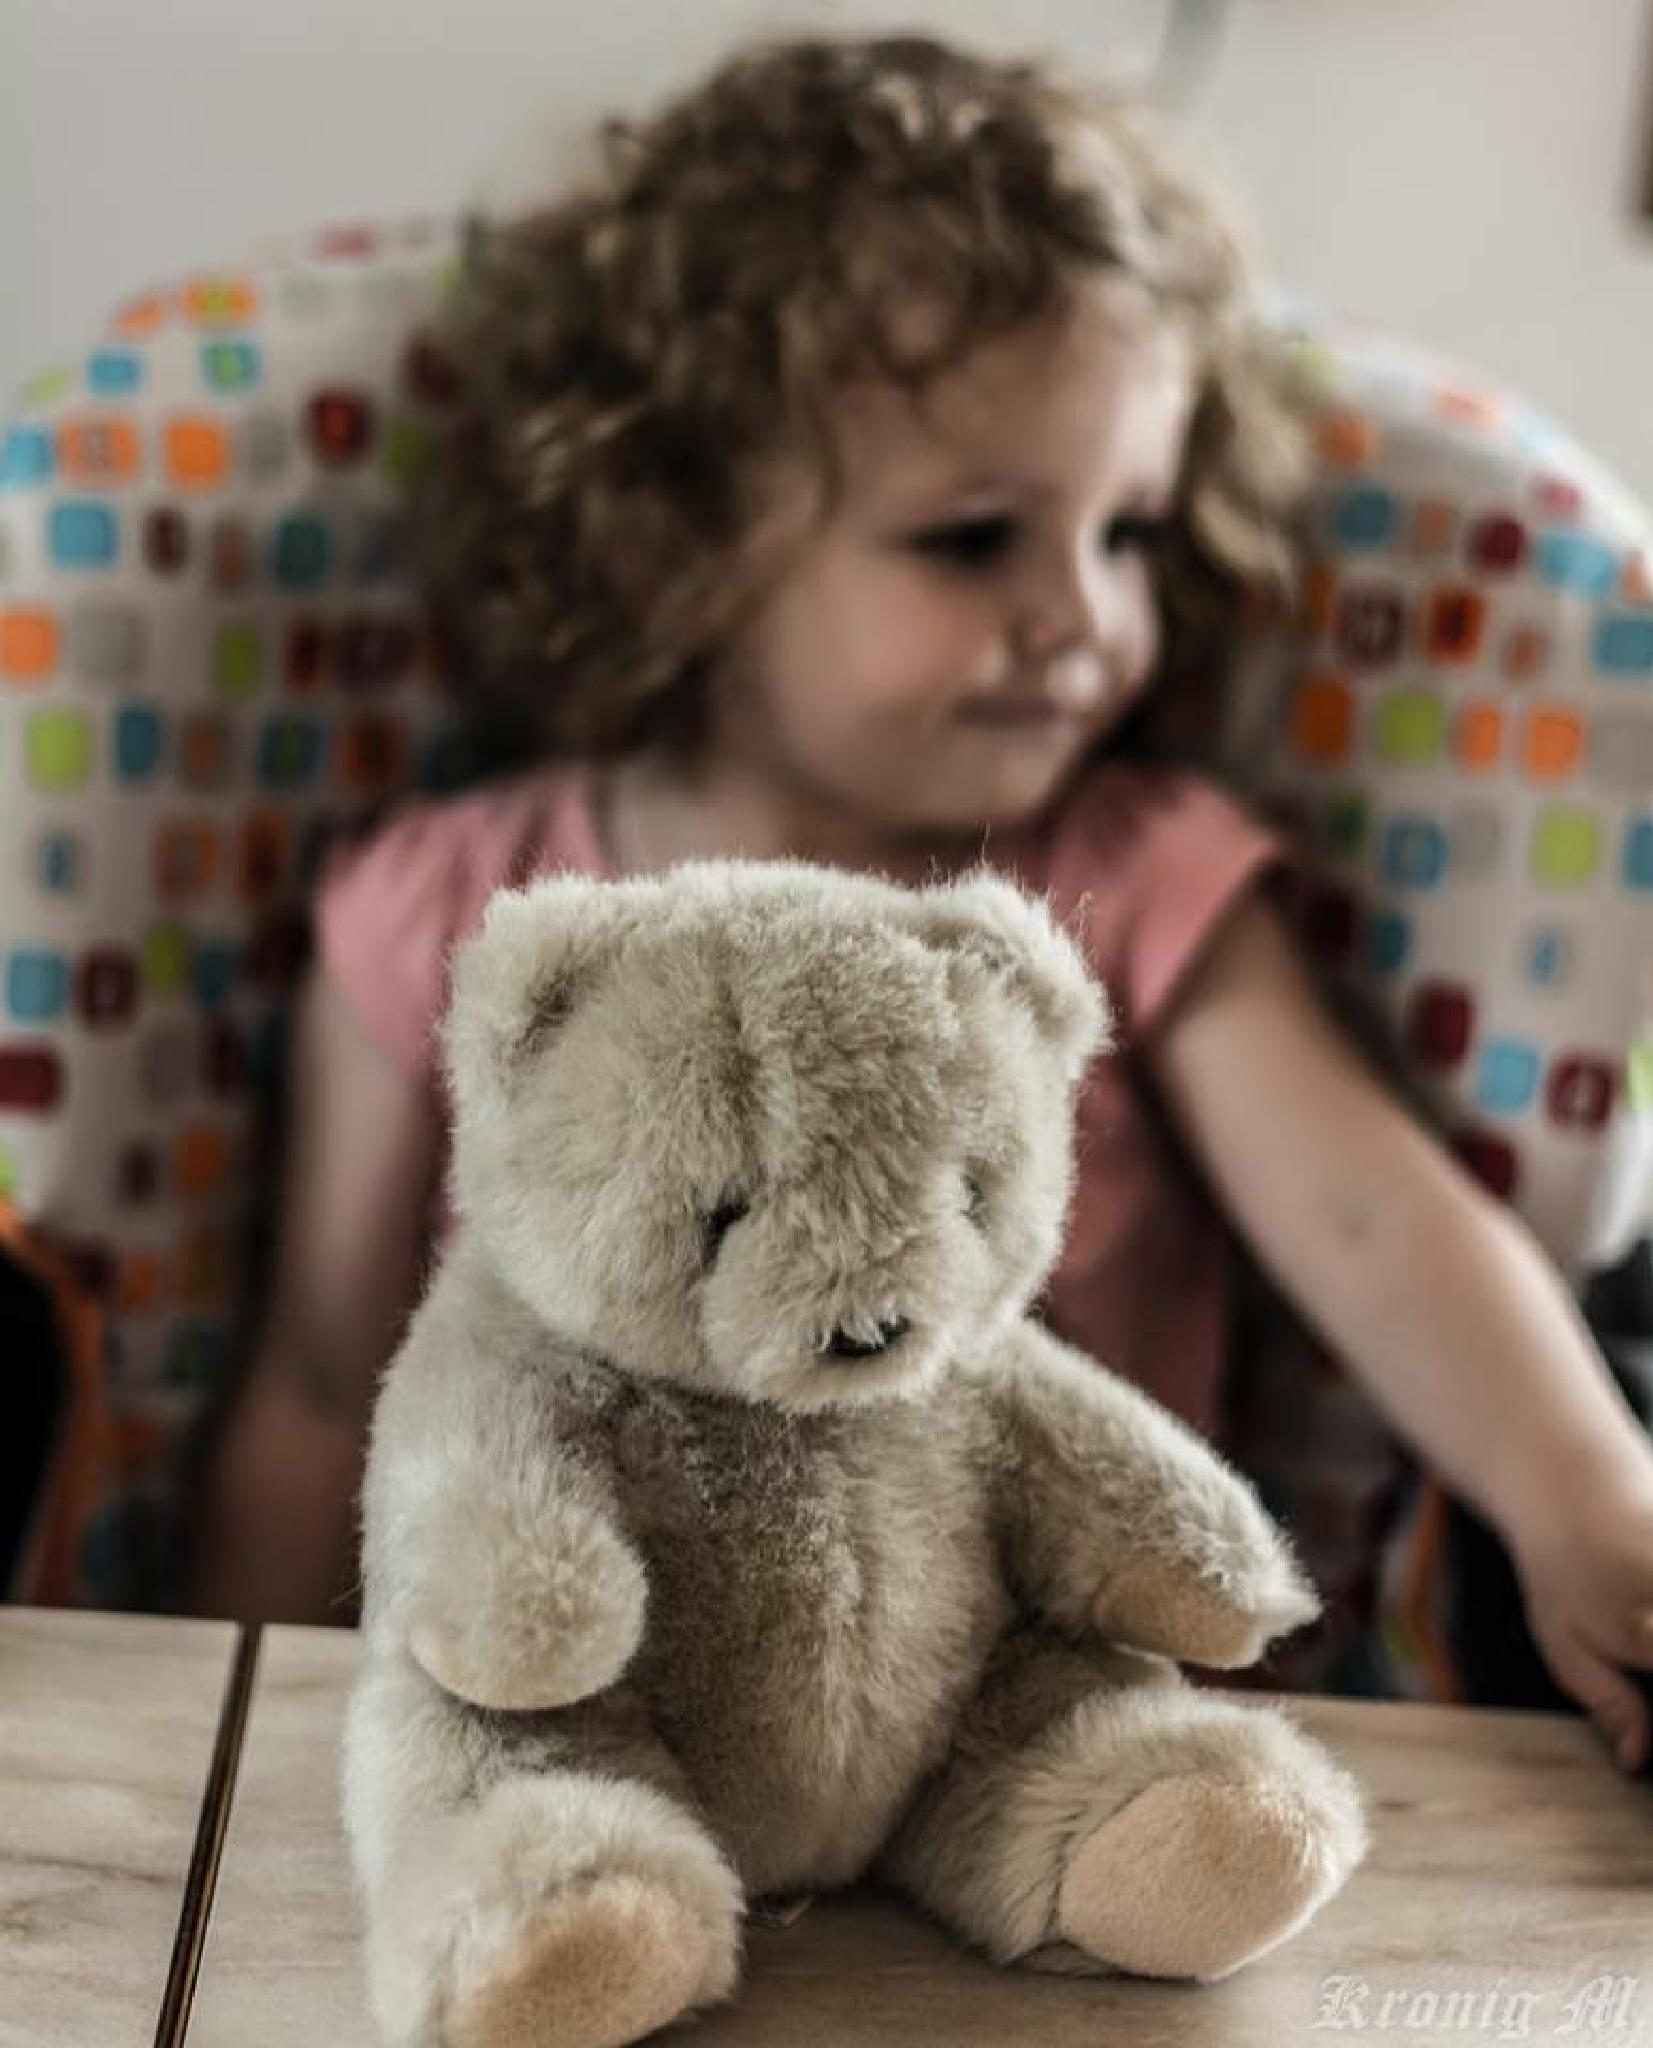 Bear with Girl by Kronig Fotografie